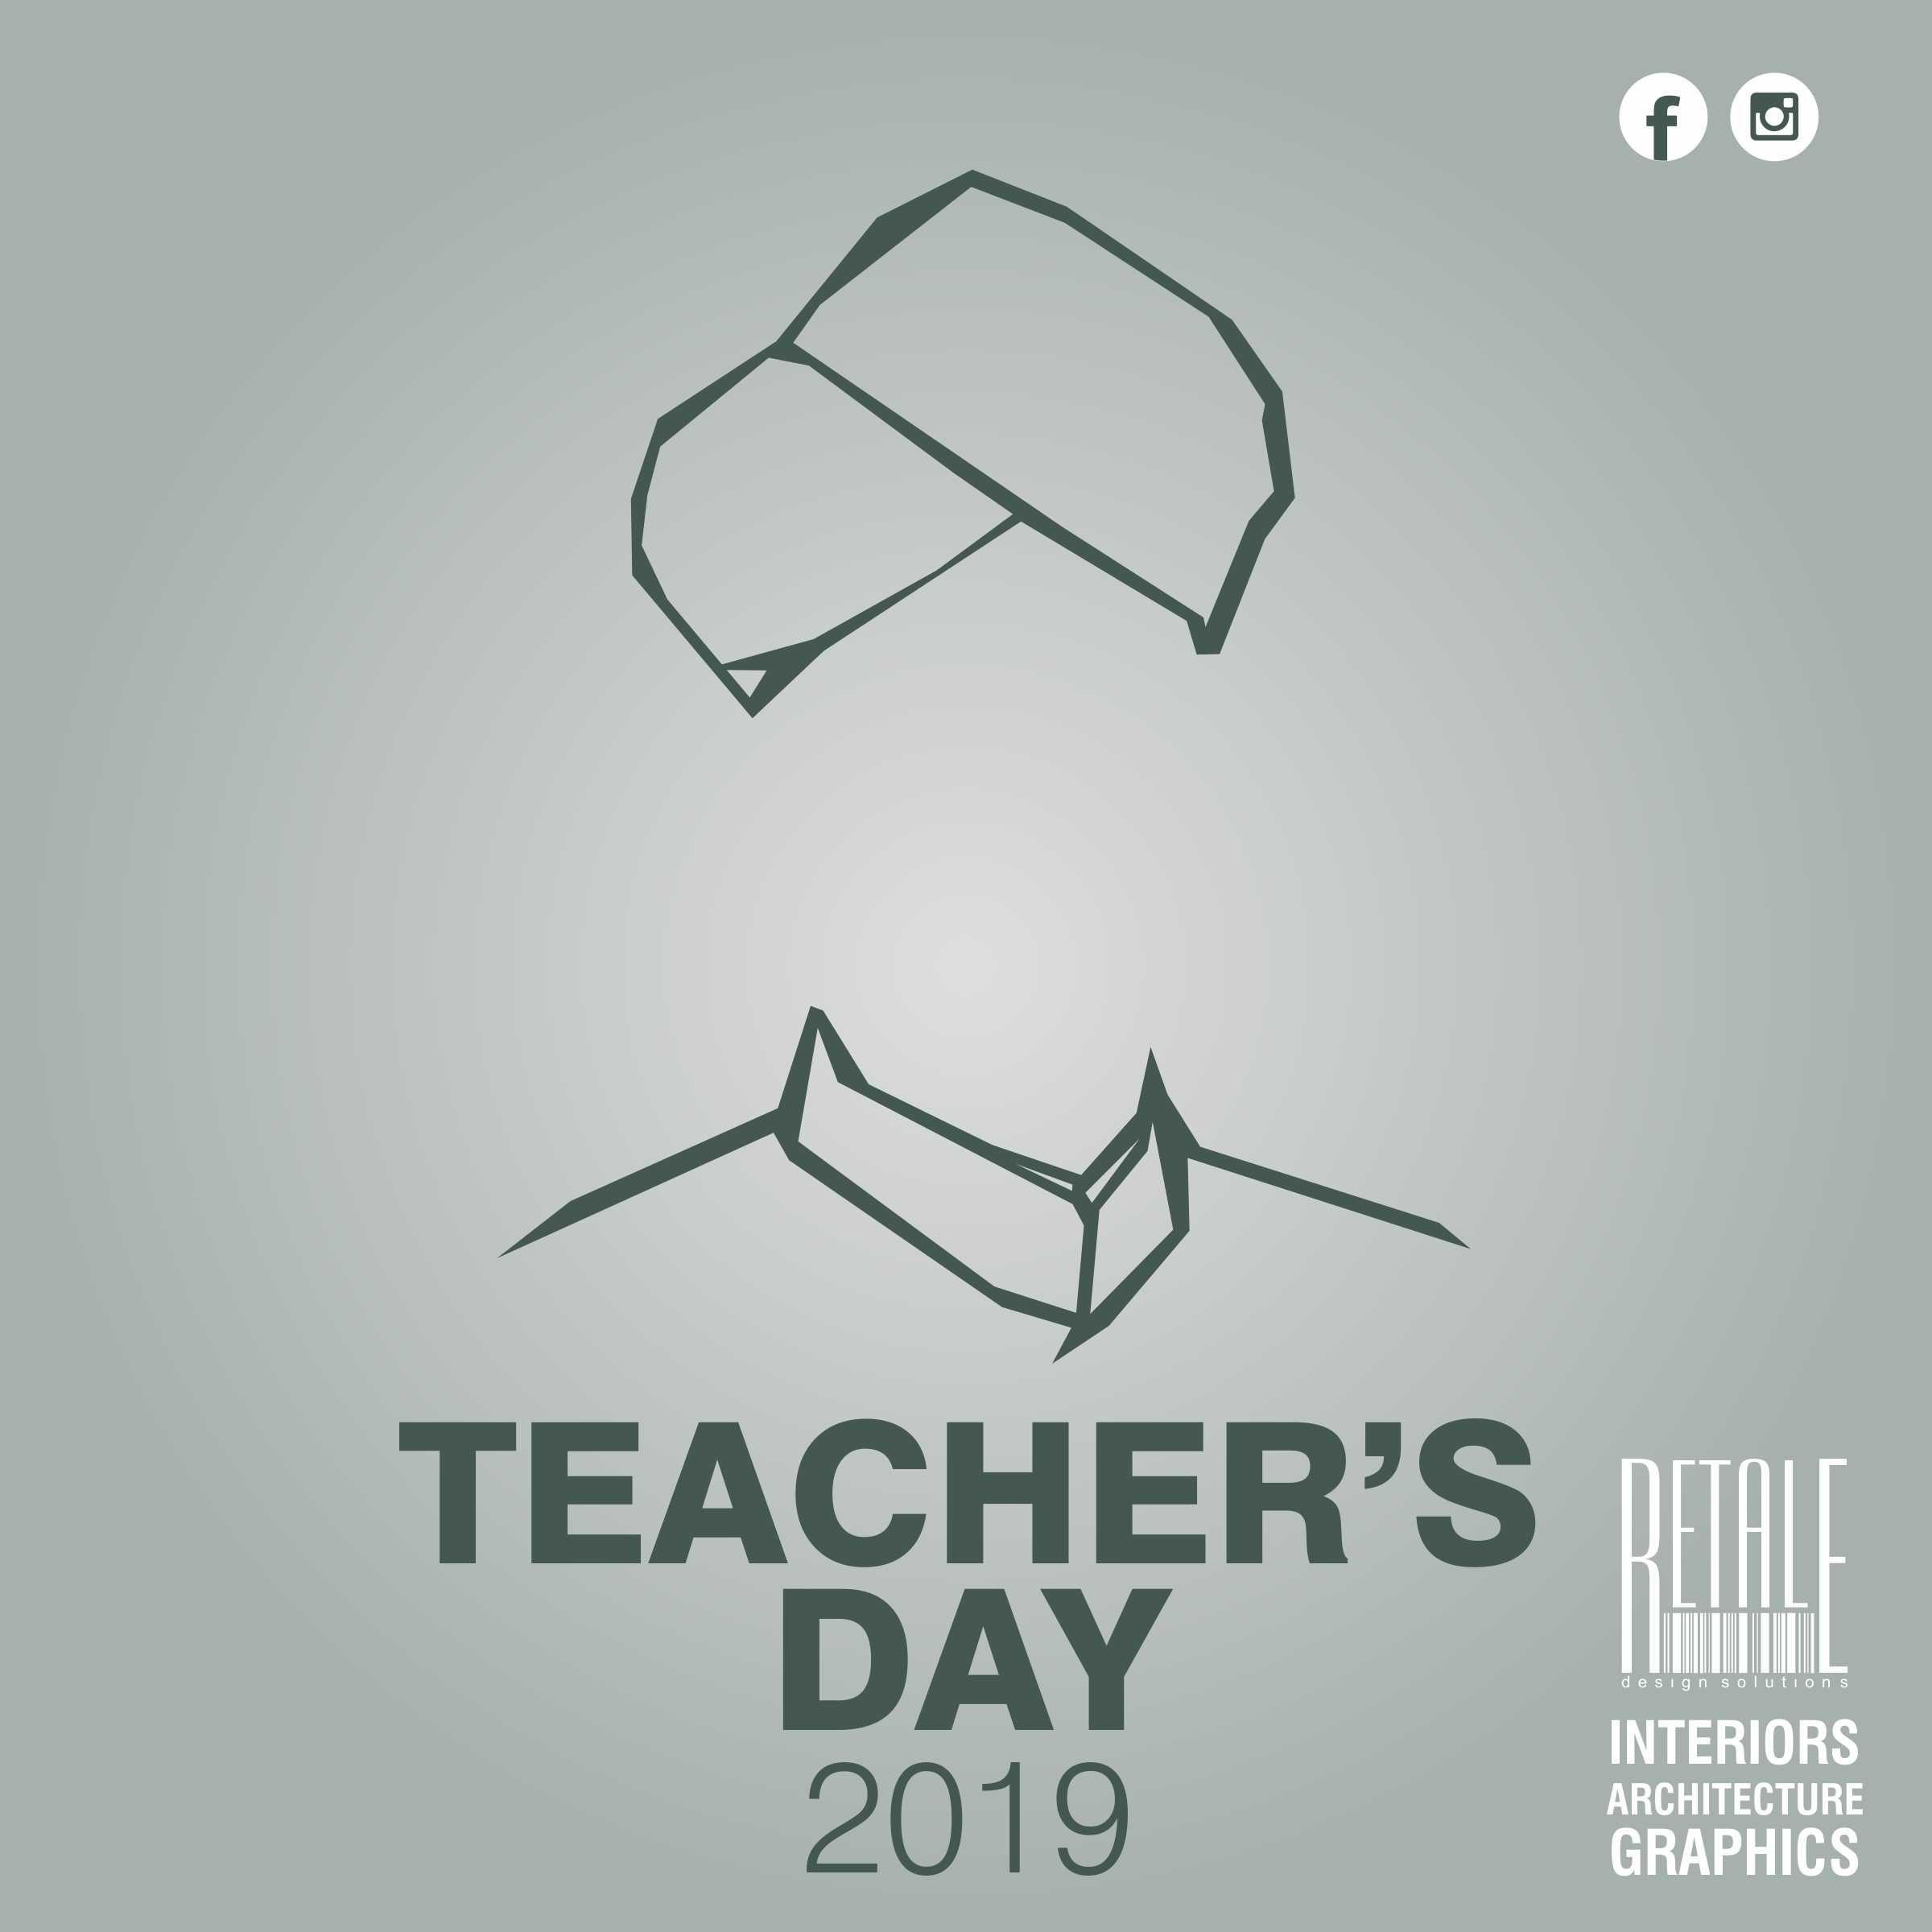 Teacher S Day Bharath Ratna Sarvepalli Radhakrishnan S Birthday Second President Of India Teachers Day Teacher Second President